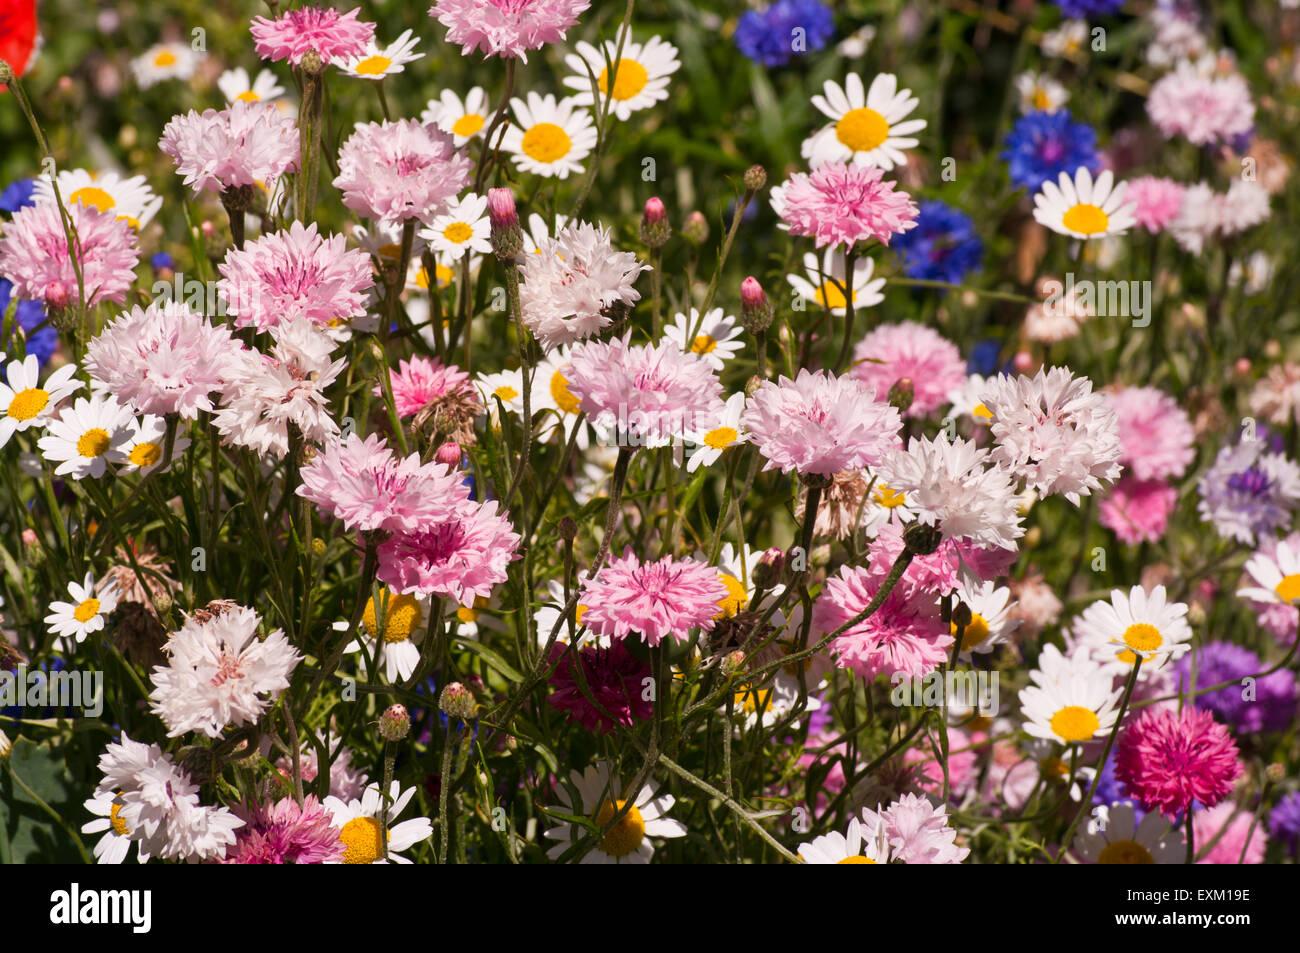 English Cottage Garden Flowers Stock Photos & English Cottage Garden ...